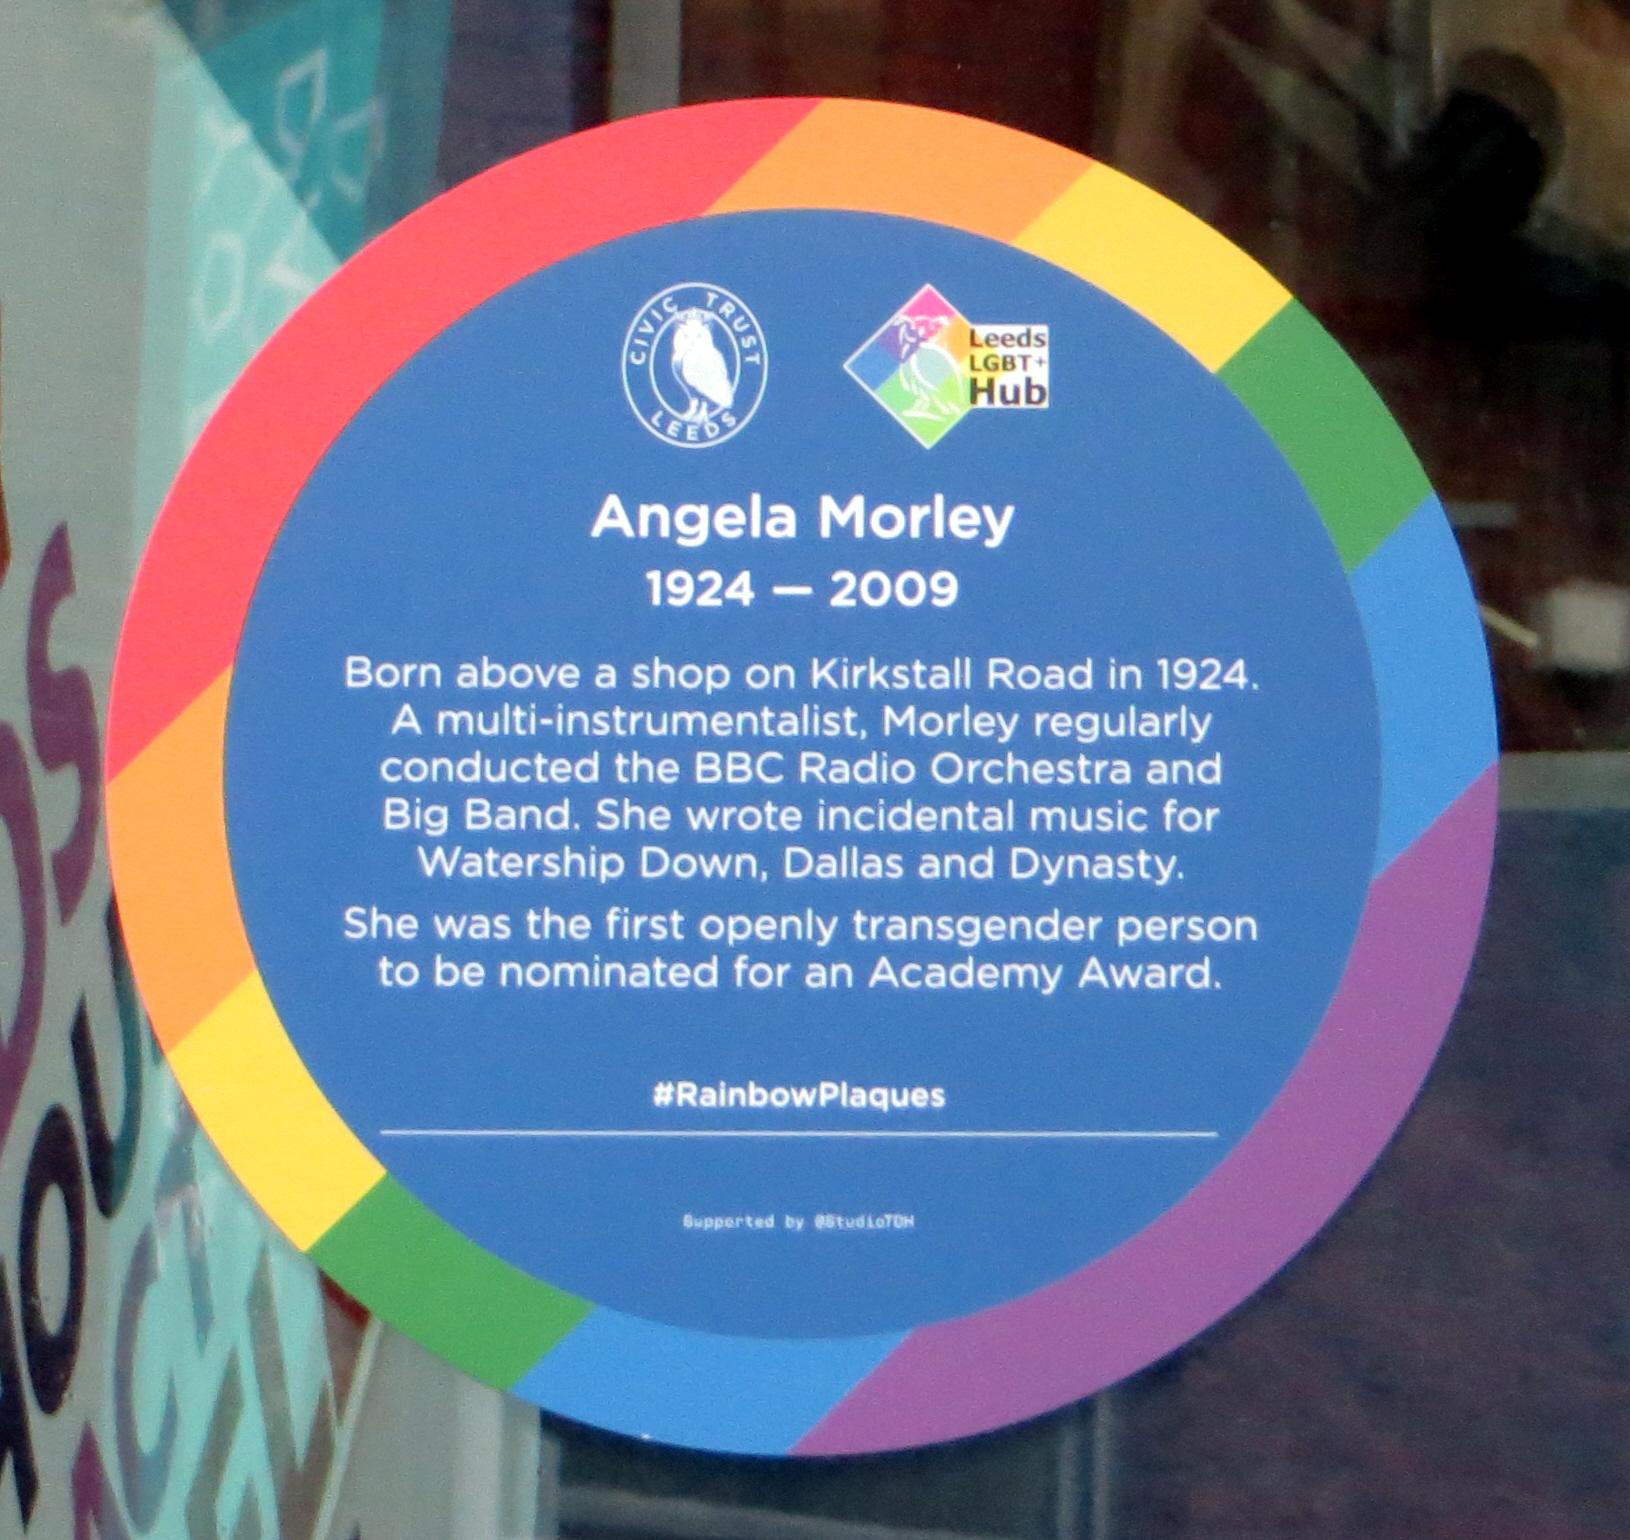 Angela Morley - Wikipedia